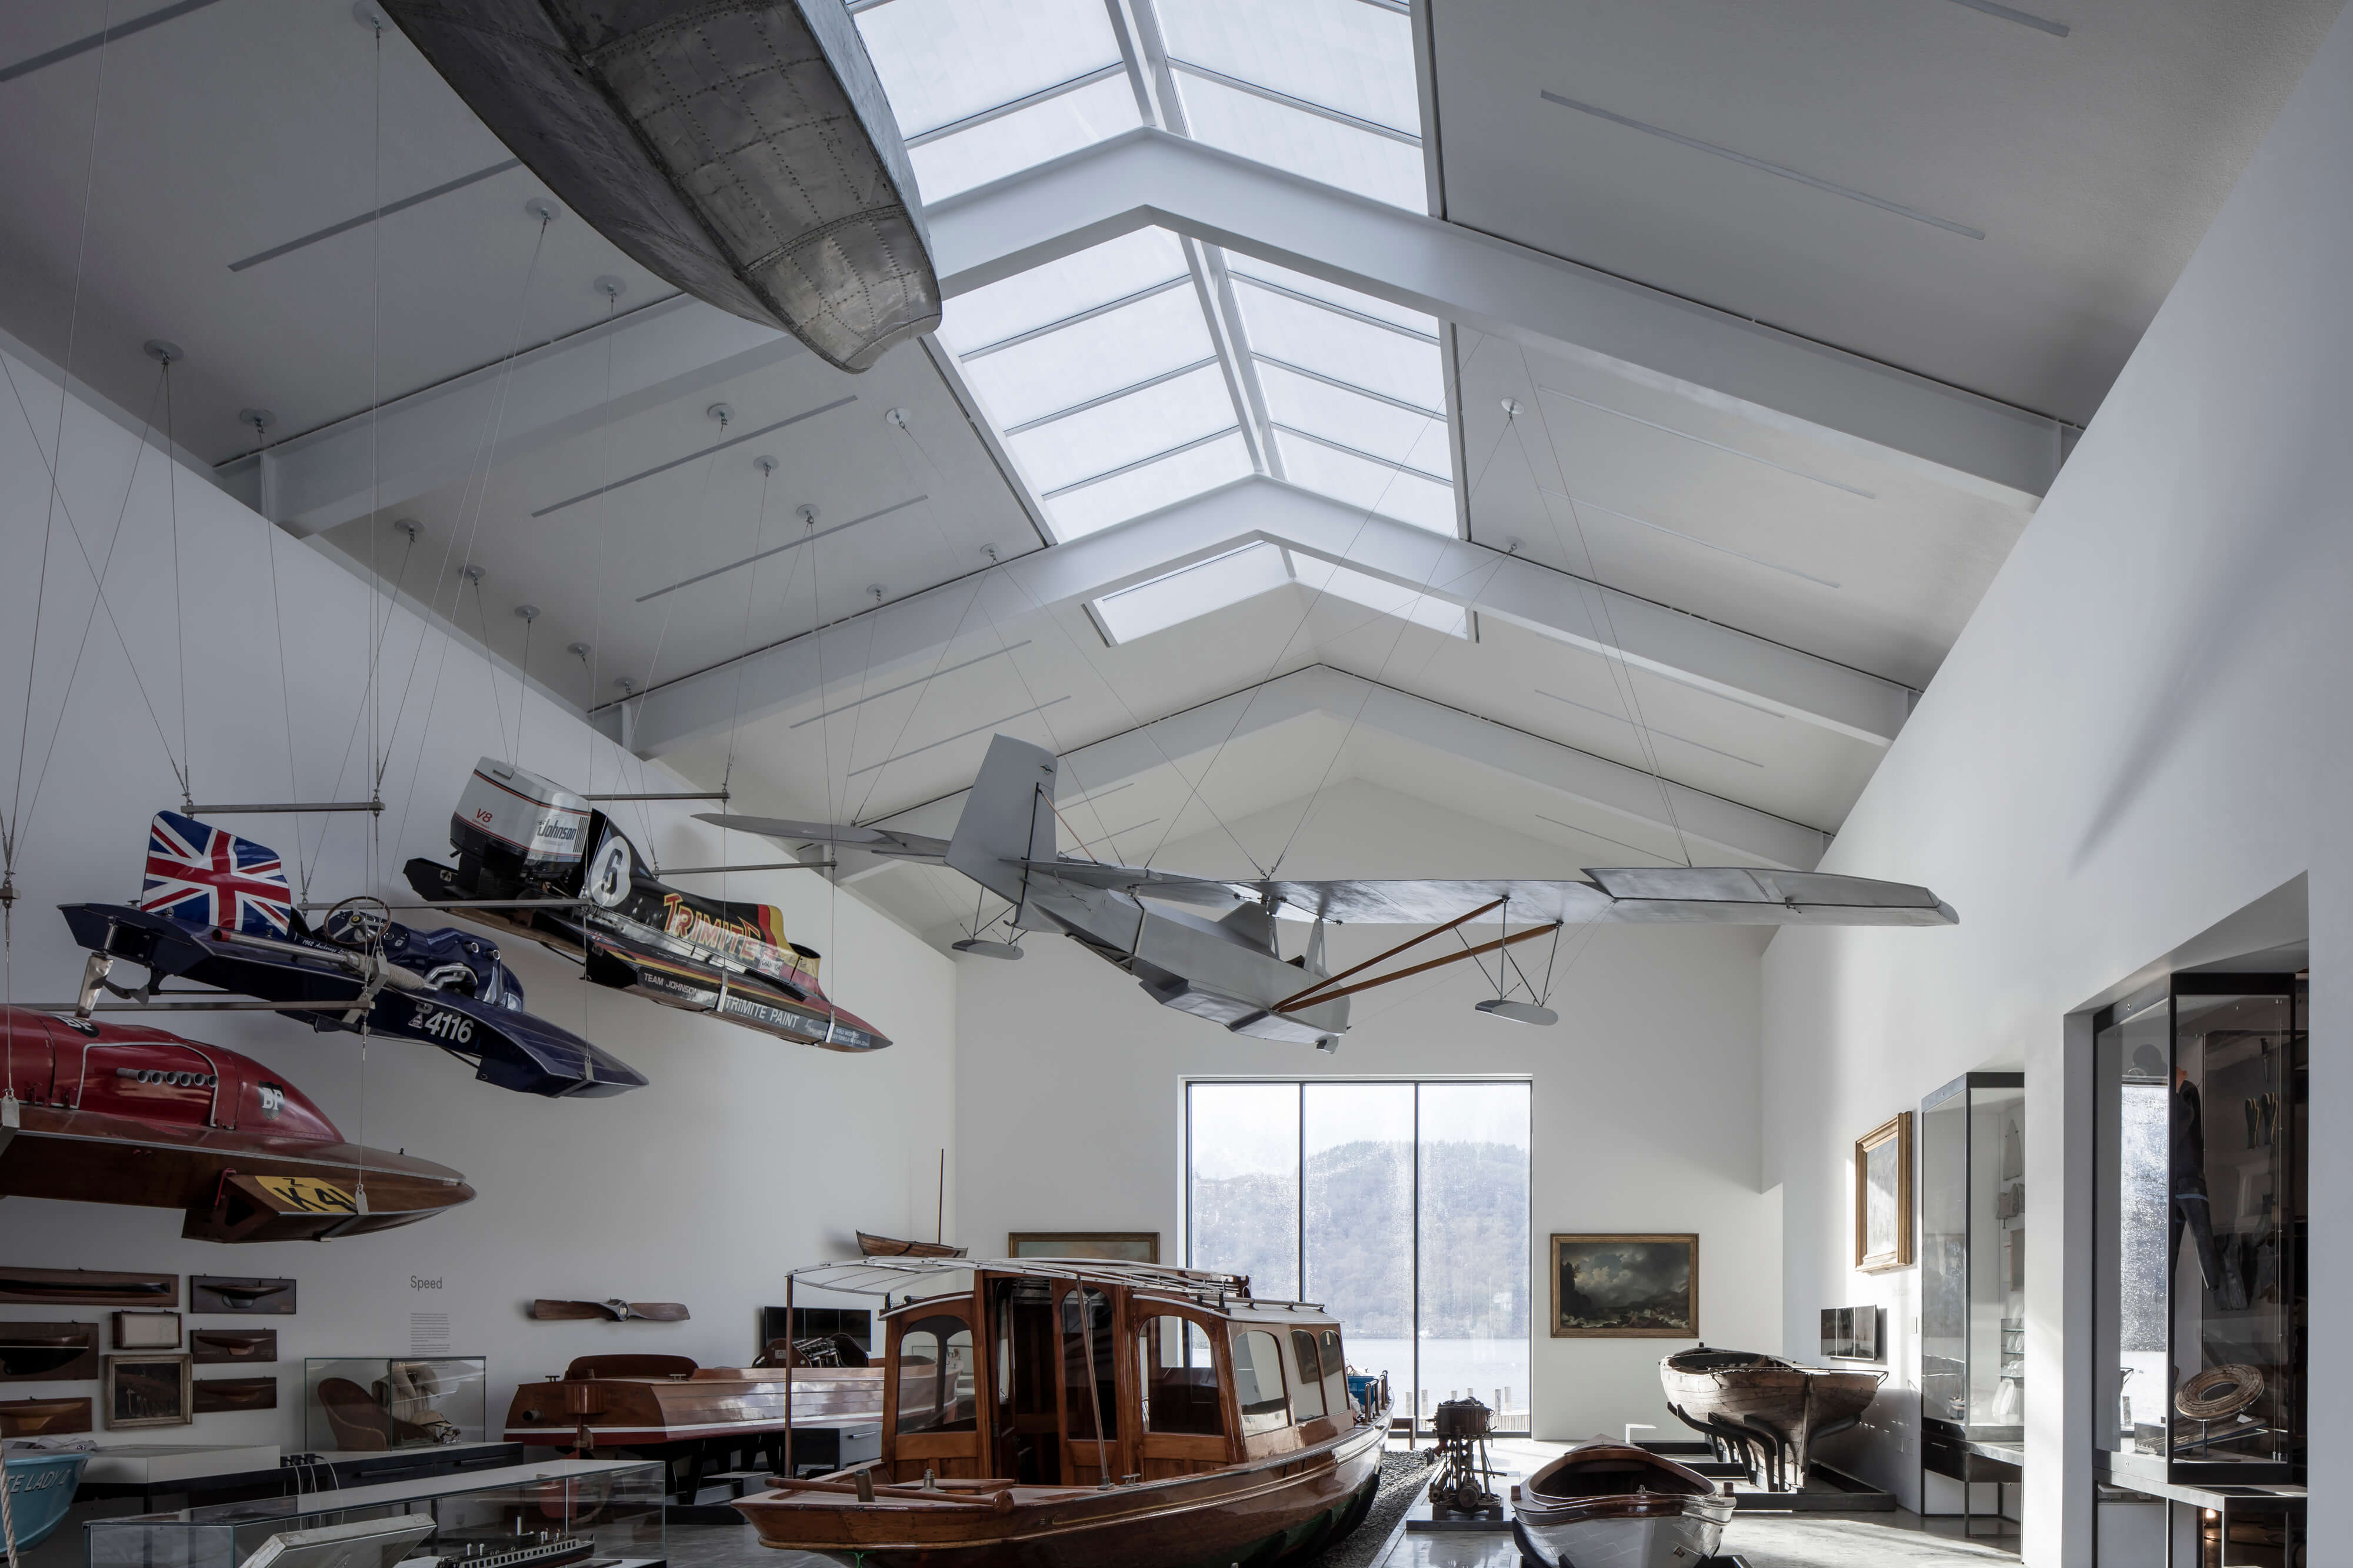 Windermere Jetty Architecture